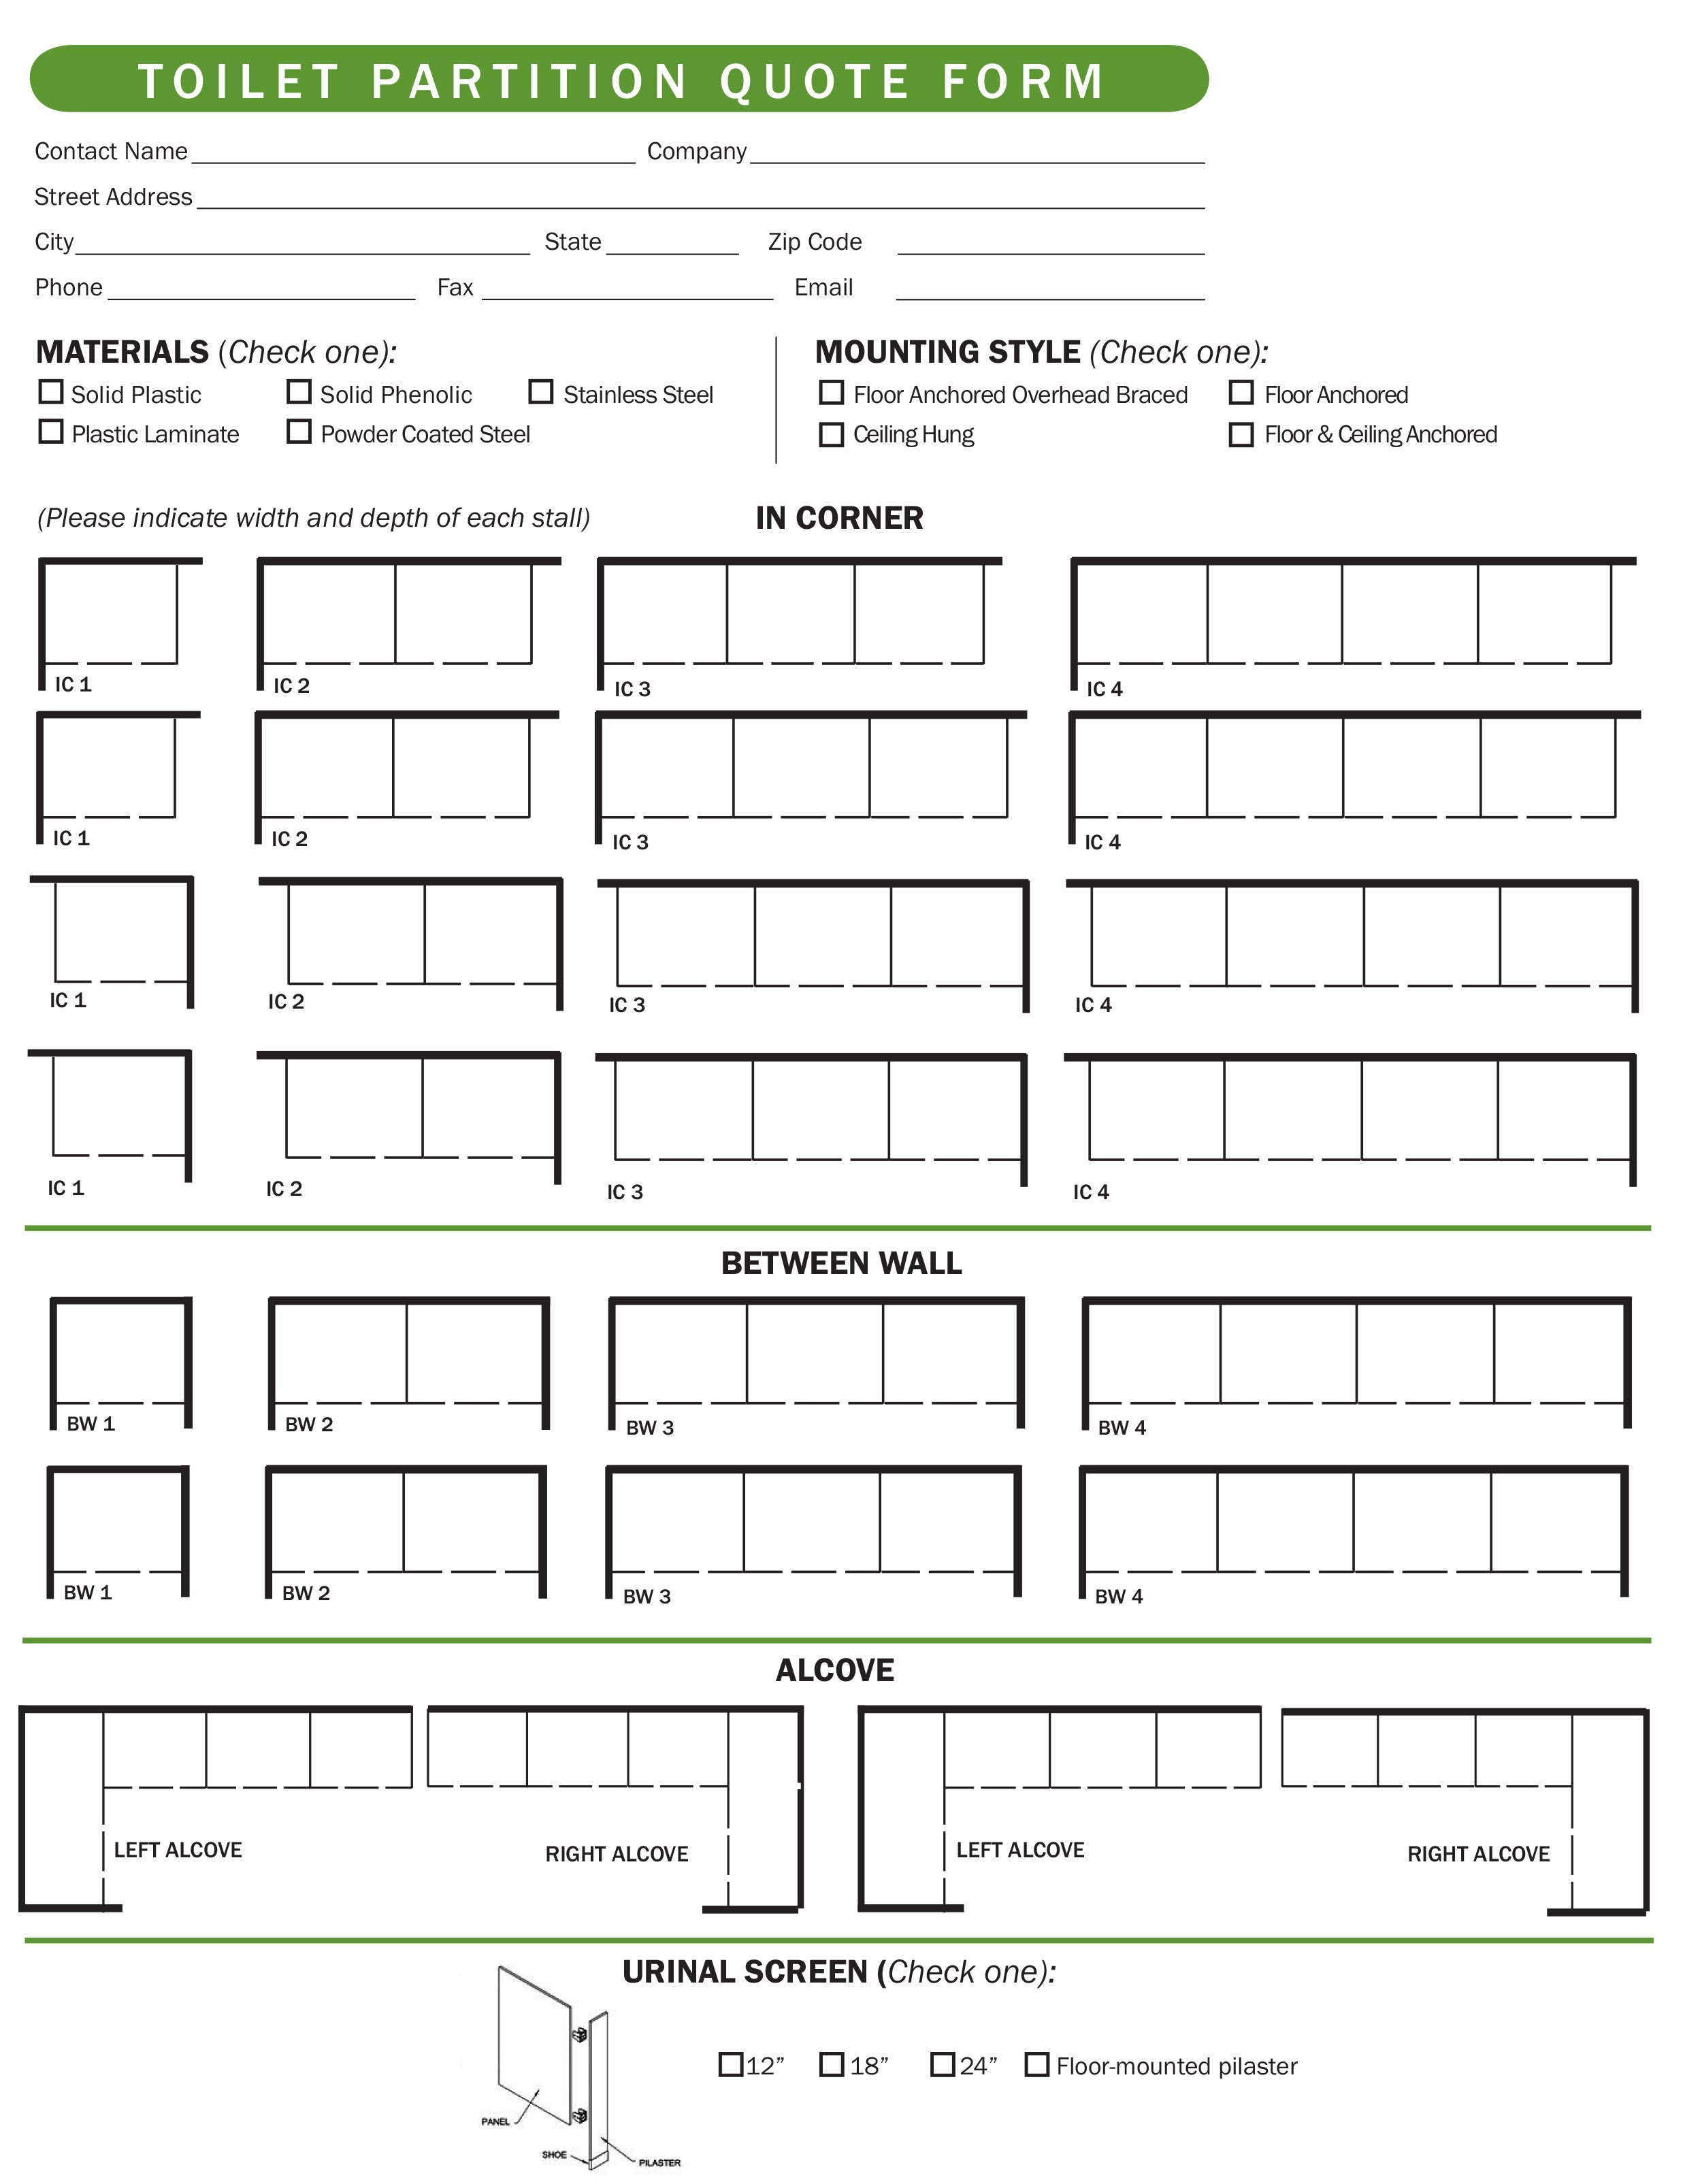 Toilet Partitions Newton Distributing - Bathroom partitions portland oregon